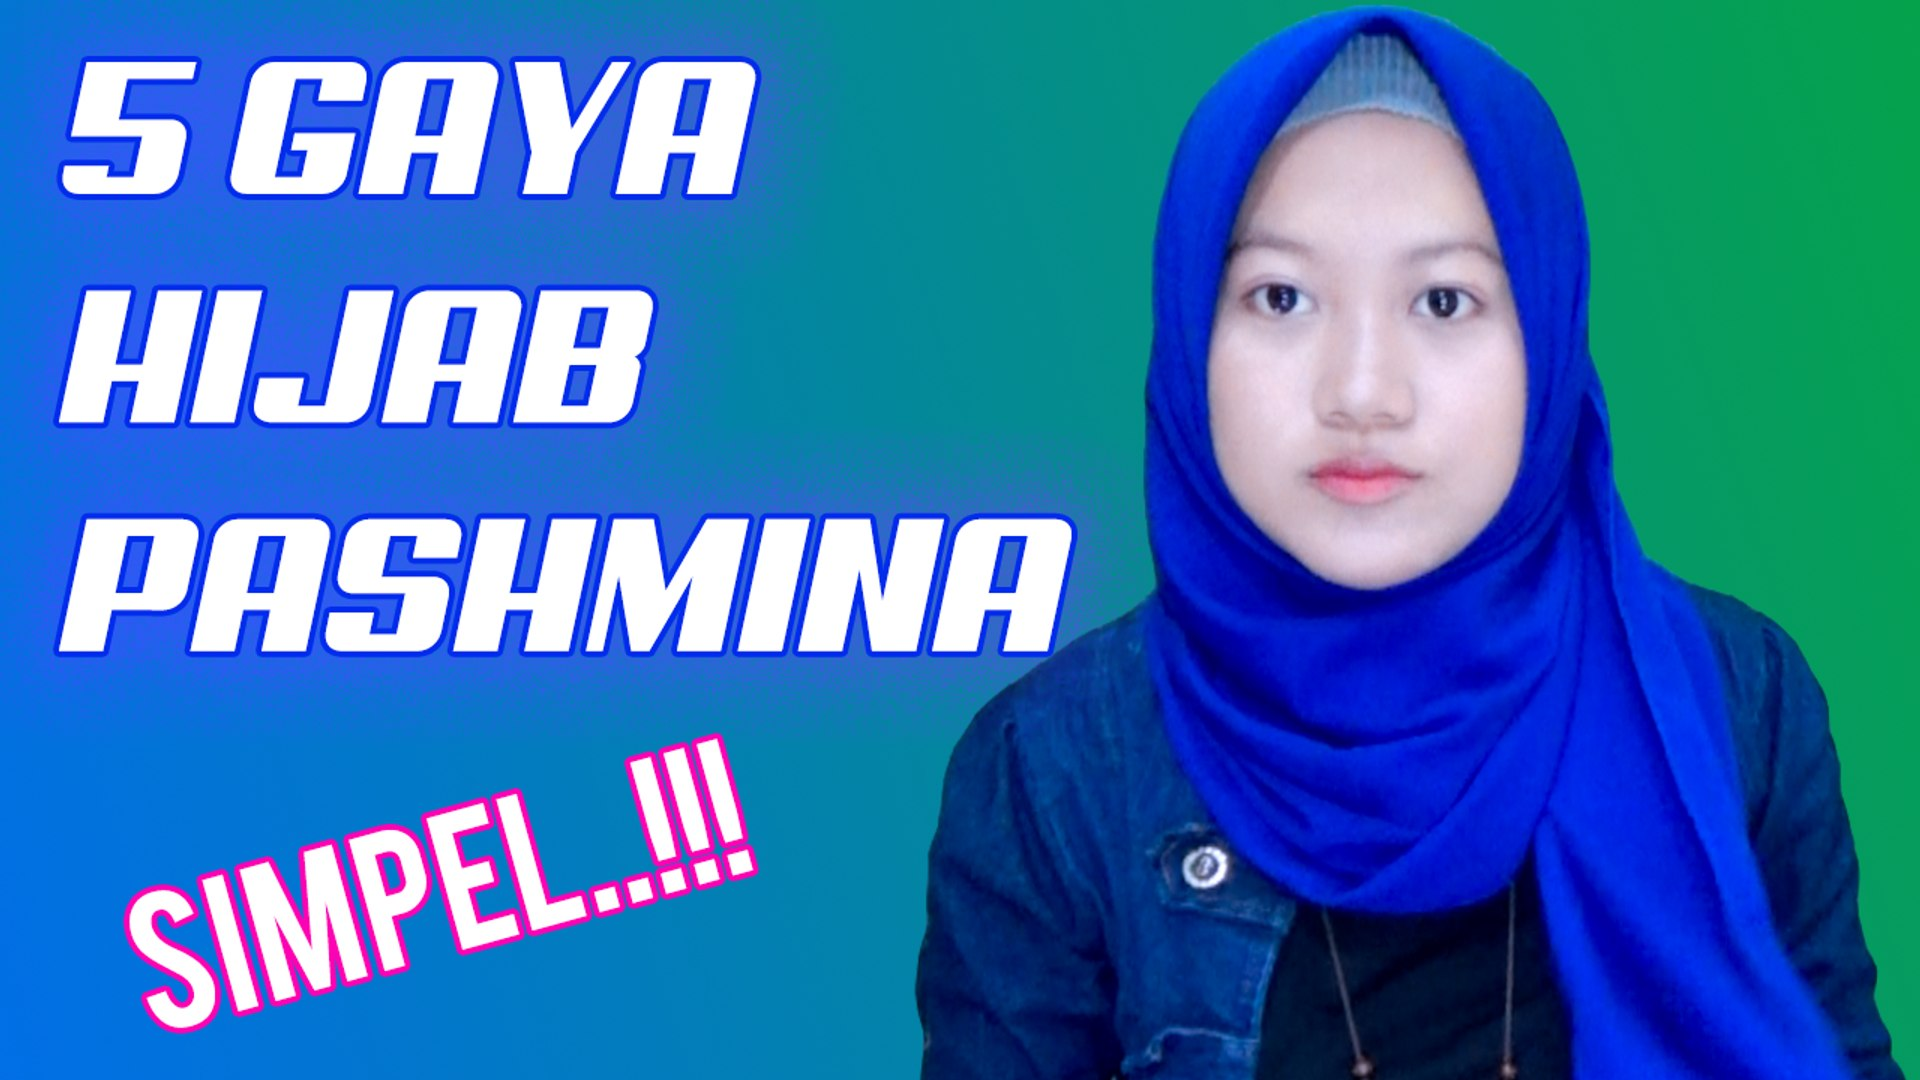 5 Tutorial Hijab Pashmina Simpel Banget Plus Tips Jadiin Segi Empat Nmy Hijab Tutorials Video Dailymotion